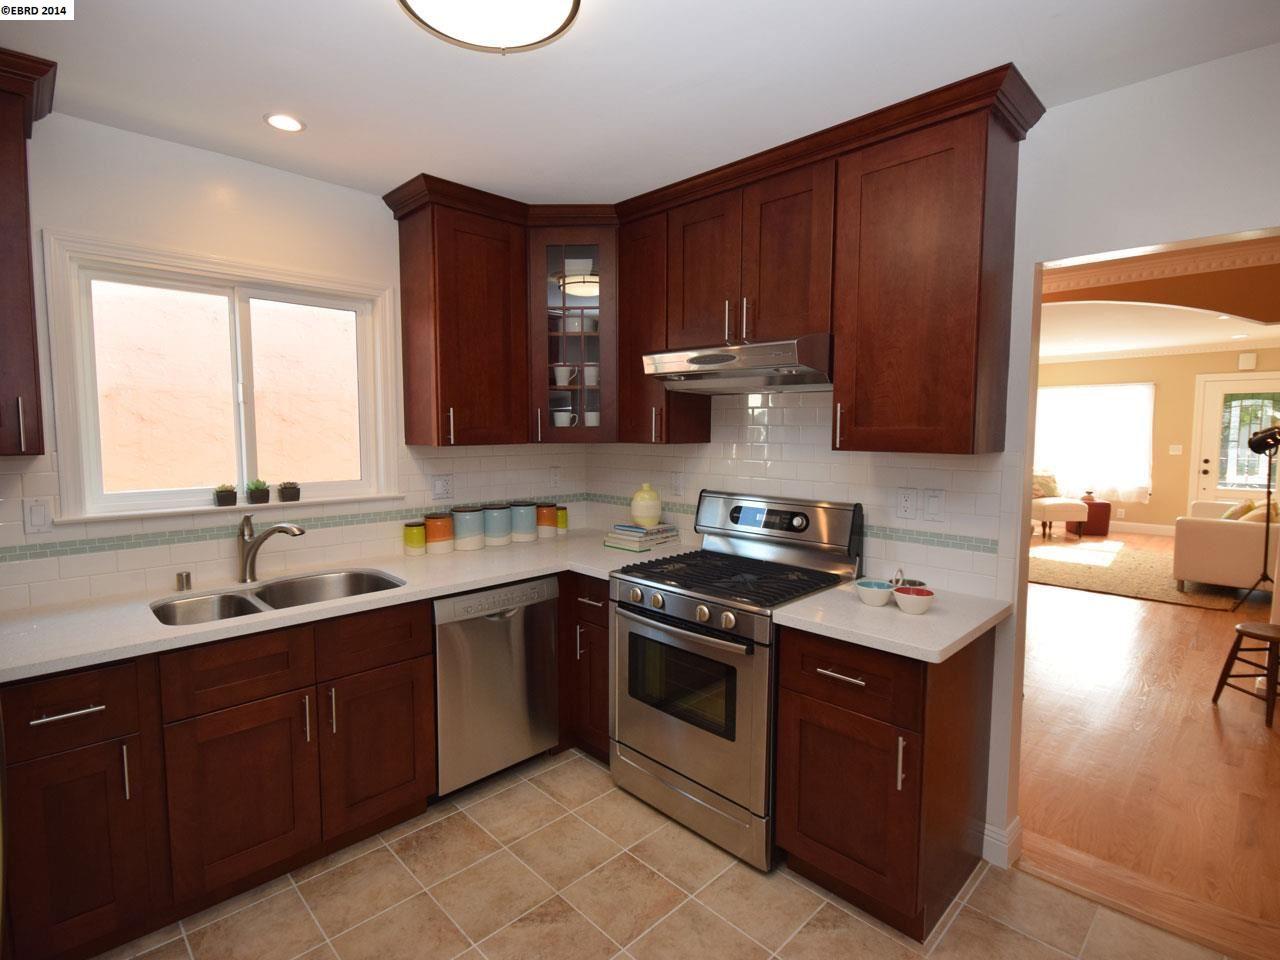 Additional photo for property listing at 949 EVELYN Avenue  Albany, Калифорния 94706 Соединенные Штаты